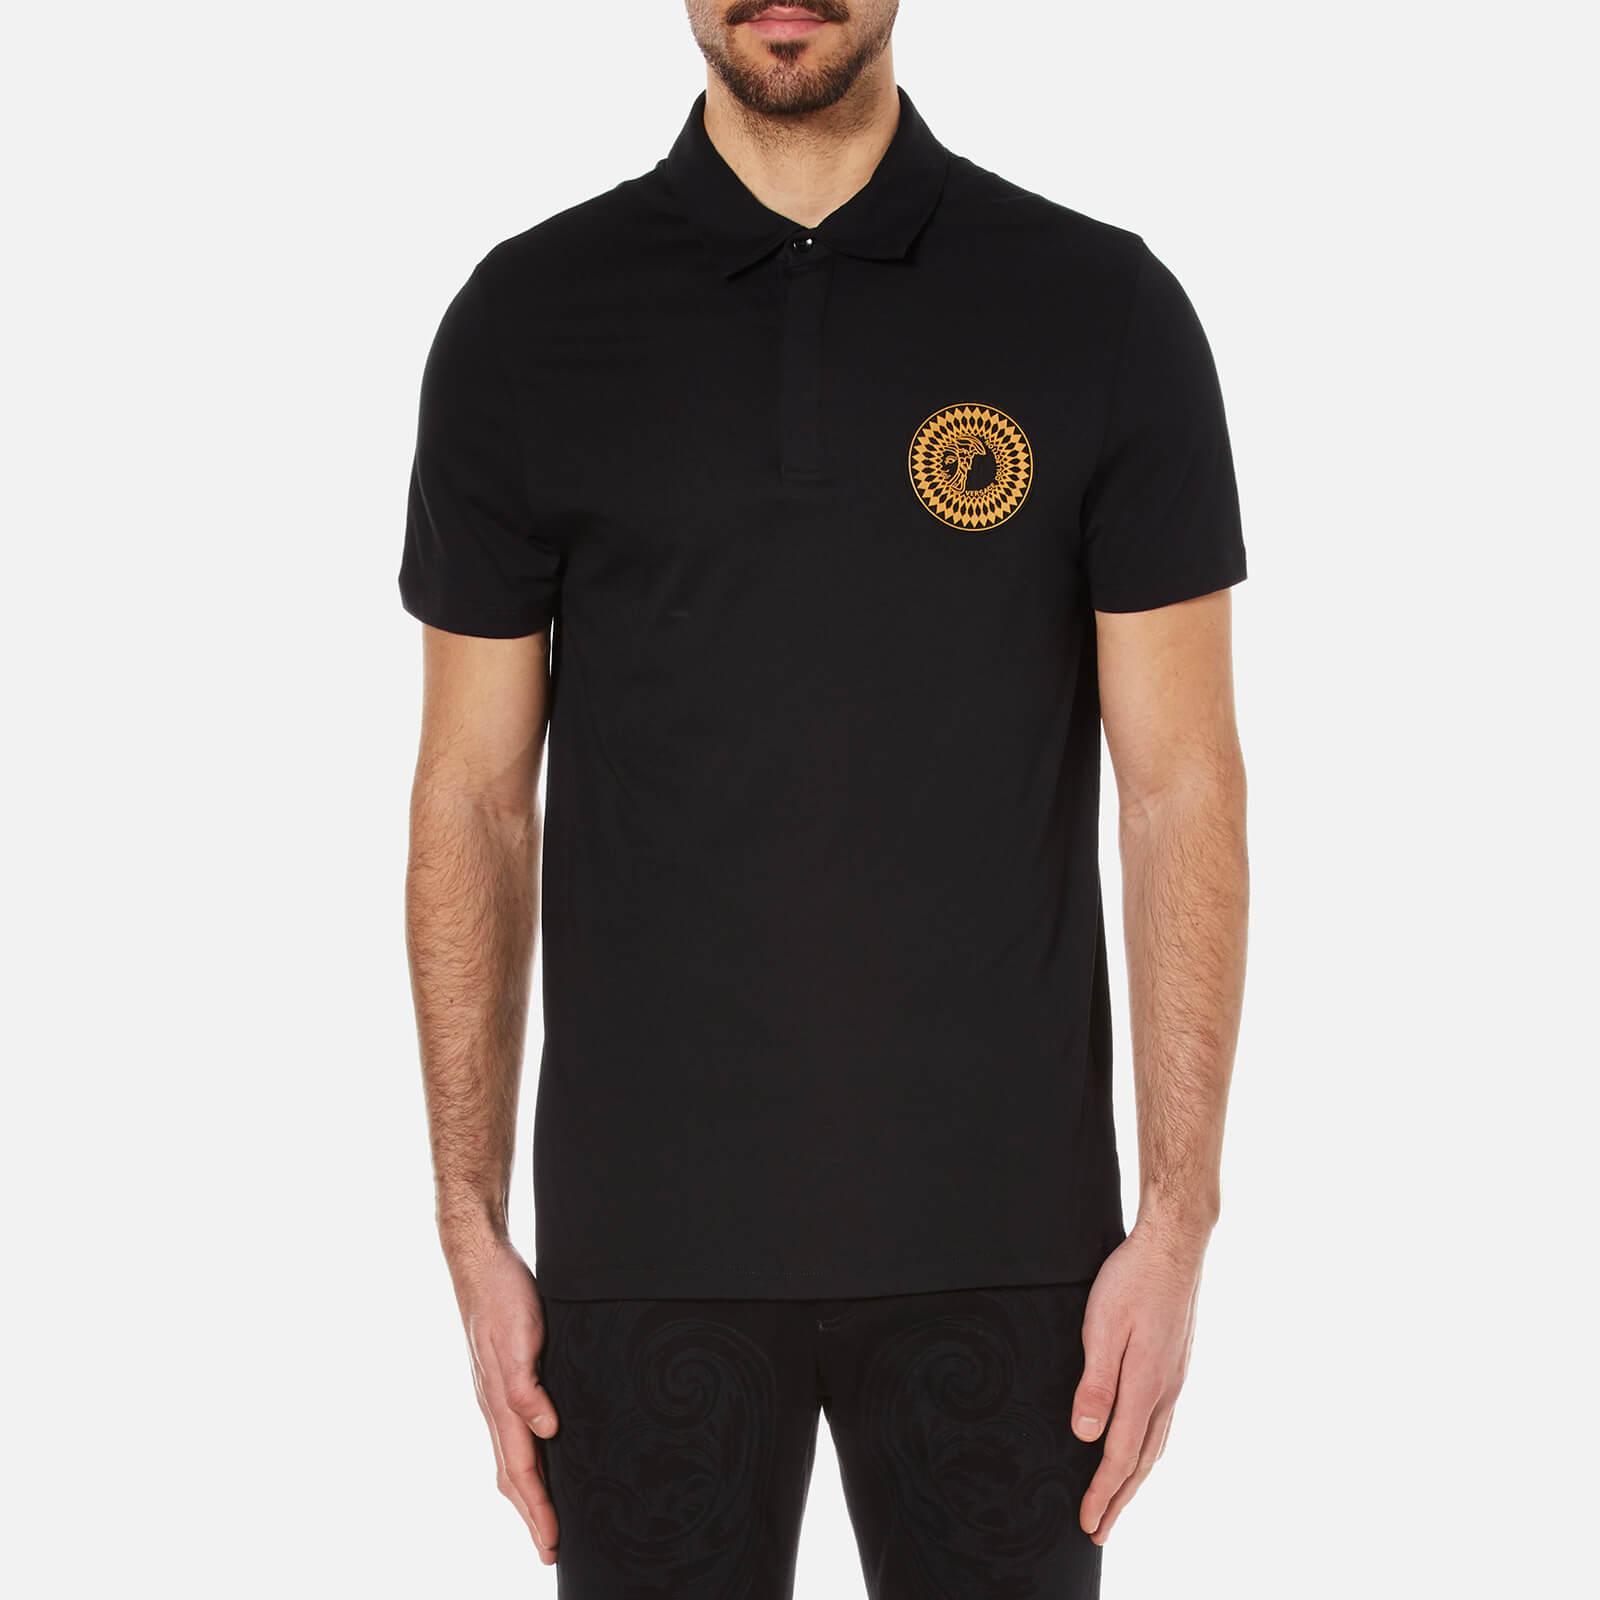 8cf33e63 Versace Collection Men's Medusa Badge Polo Shirt - Black - Free UK Delivery  over £50